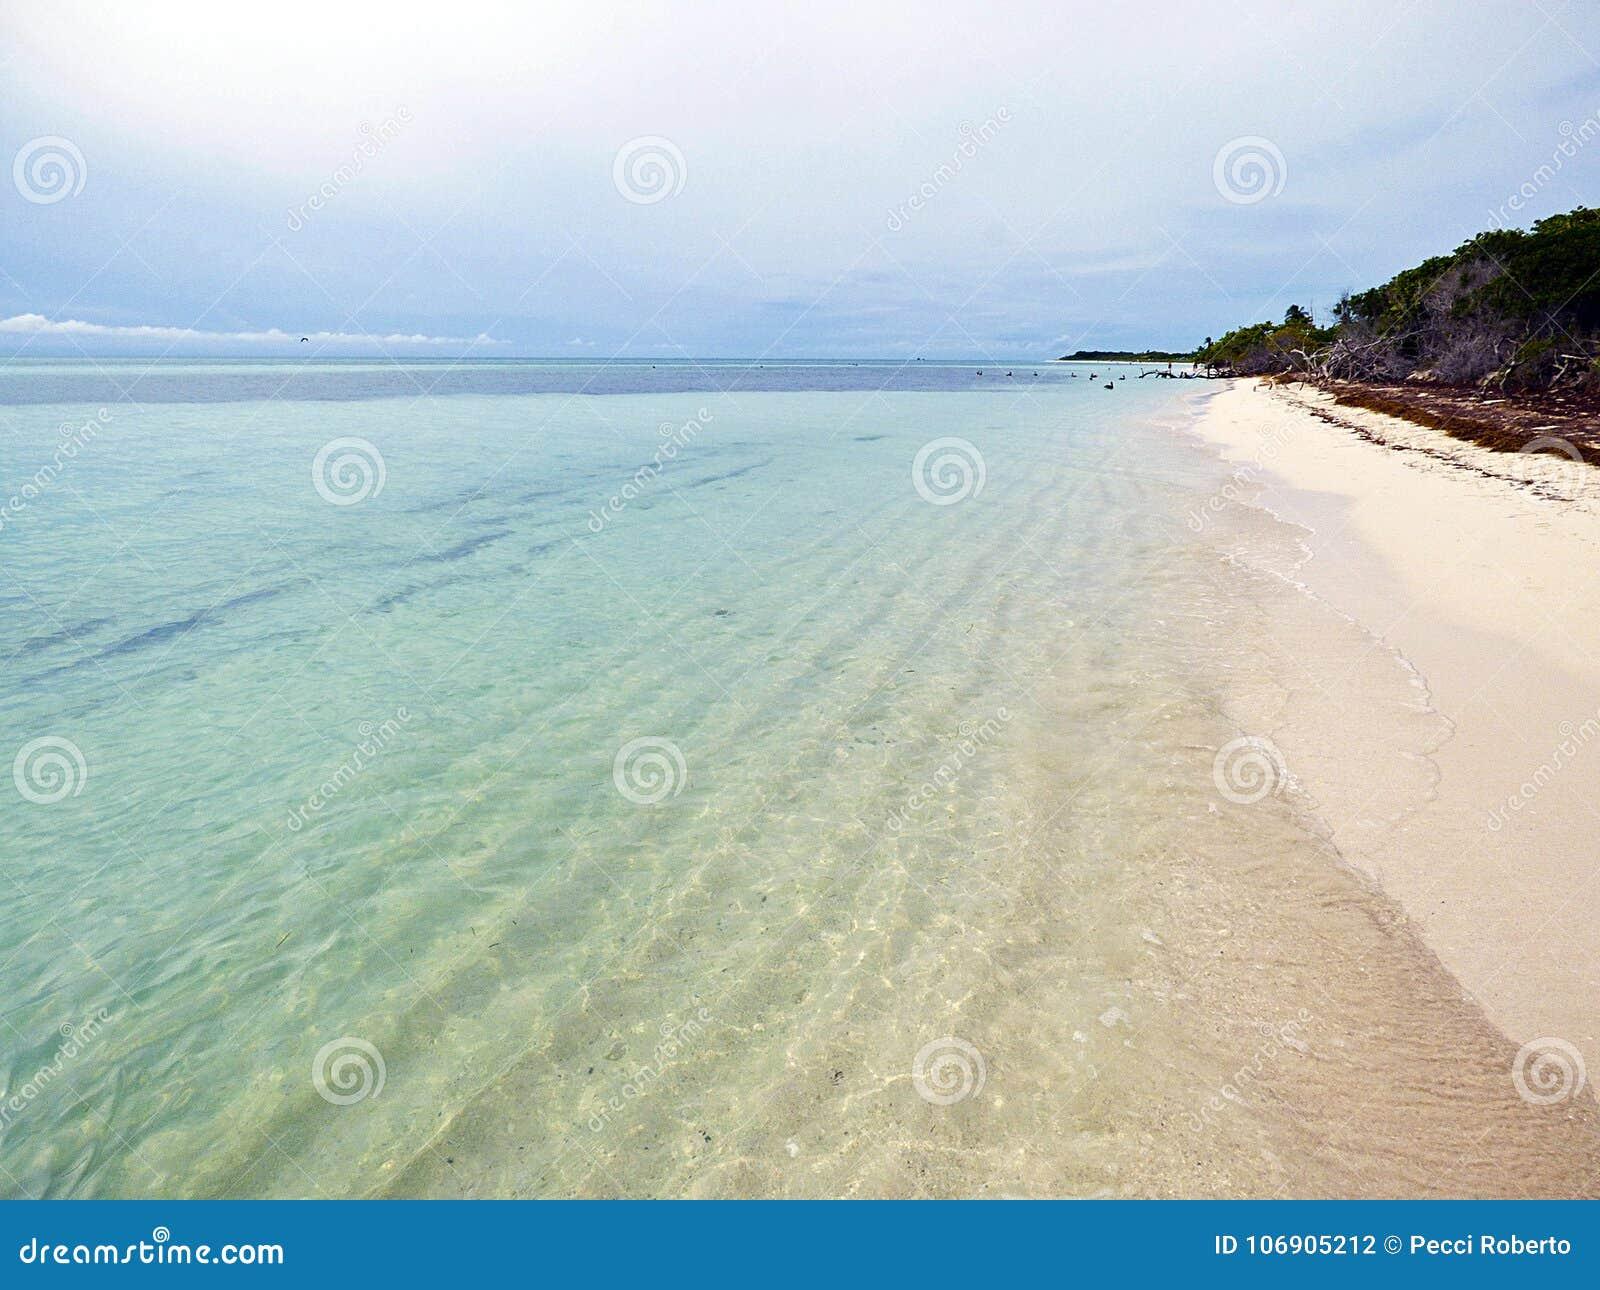 Floryda Klucze Stanu park Bahia Honda, widok plaża